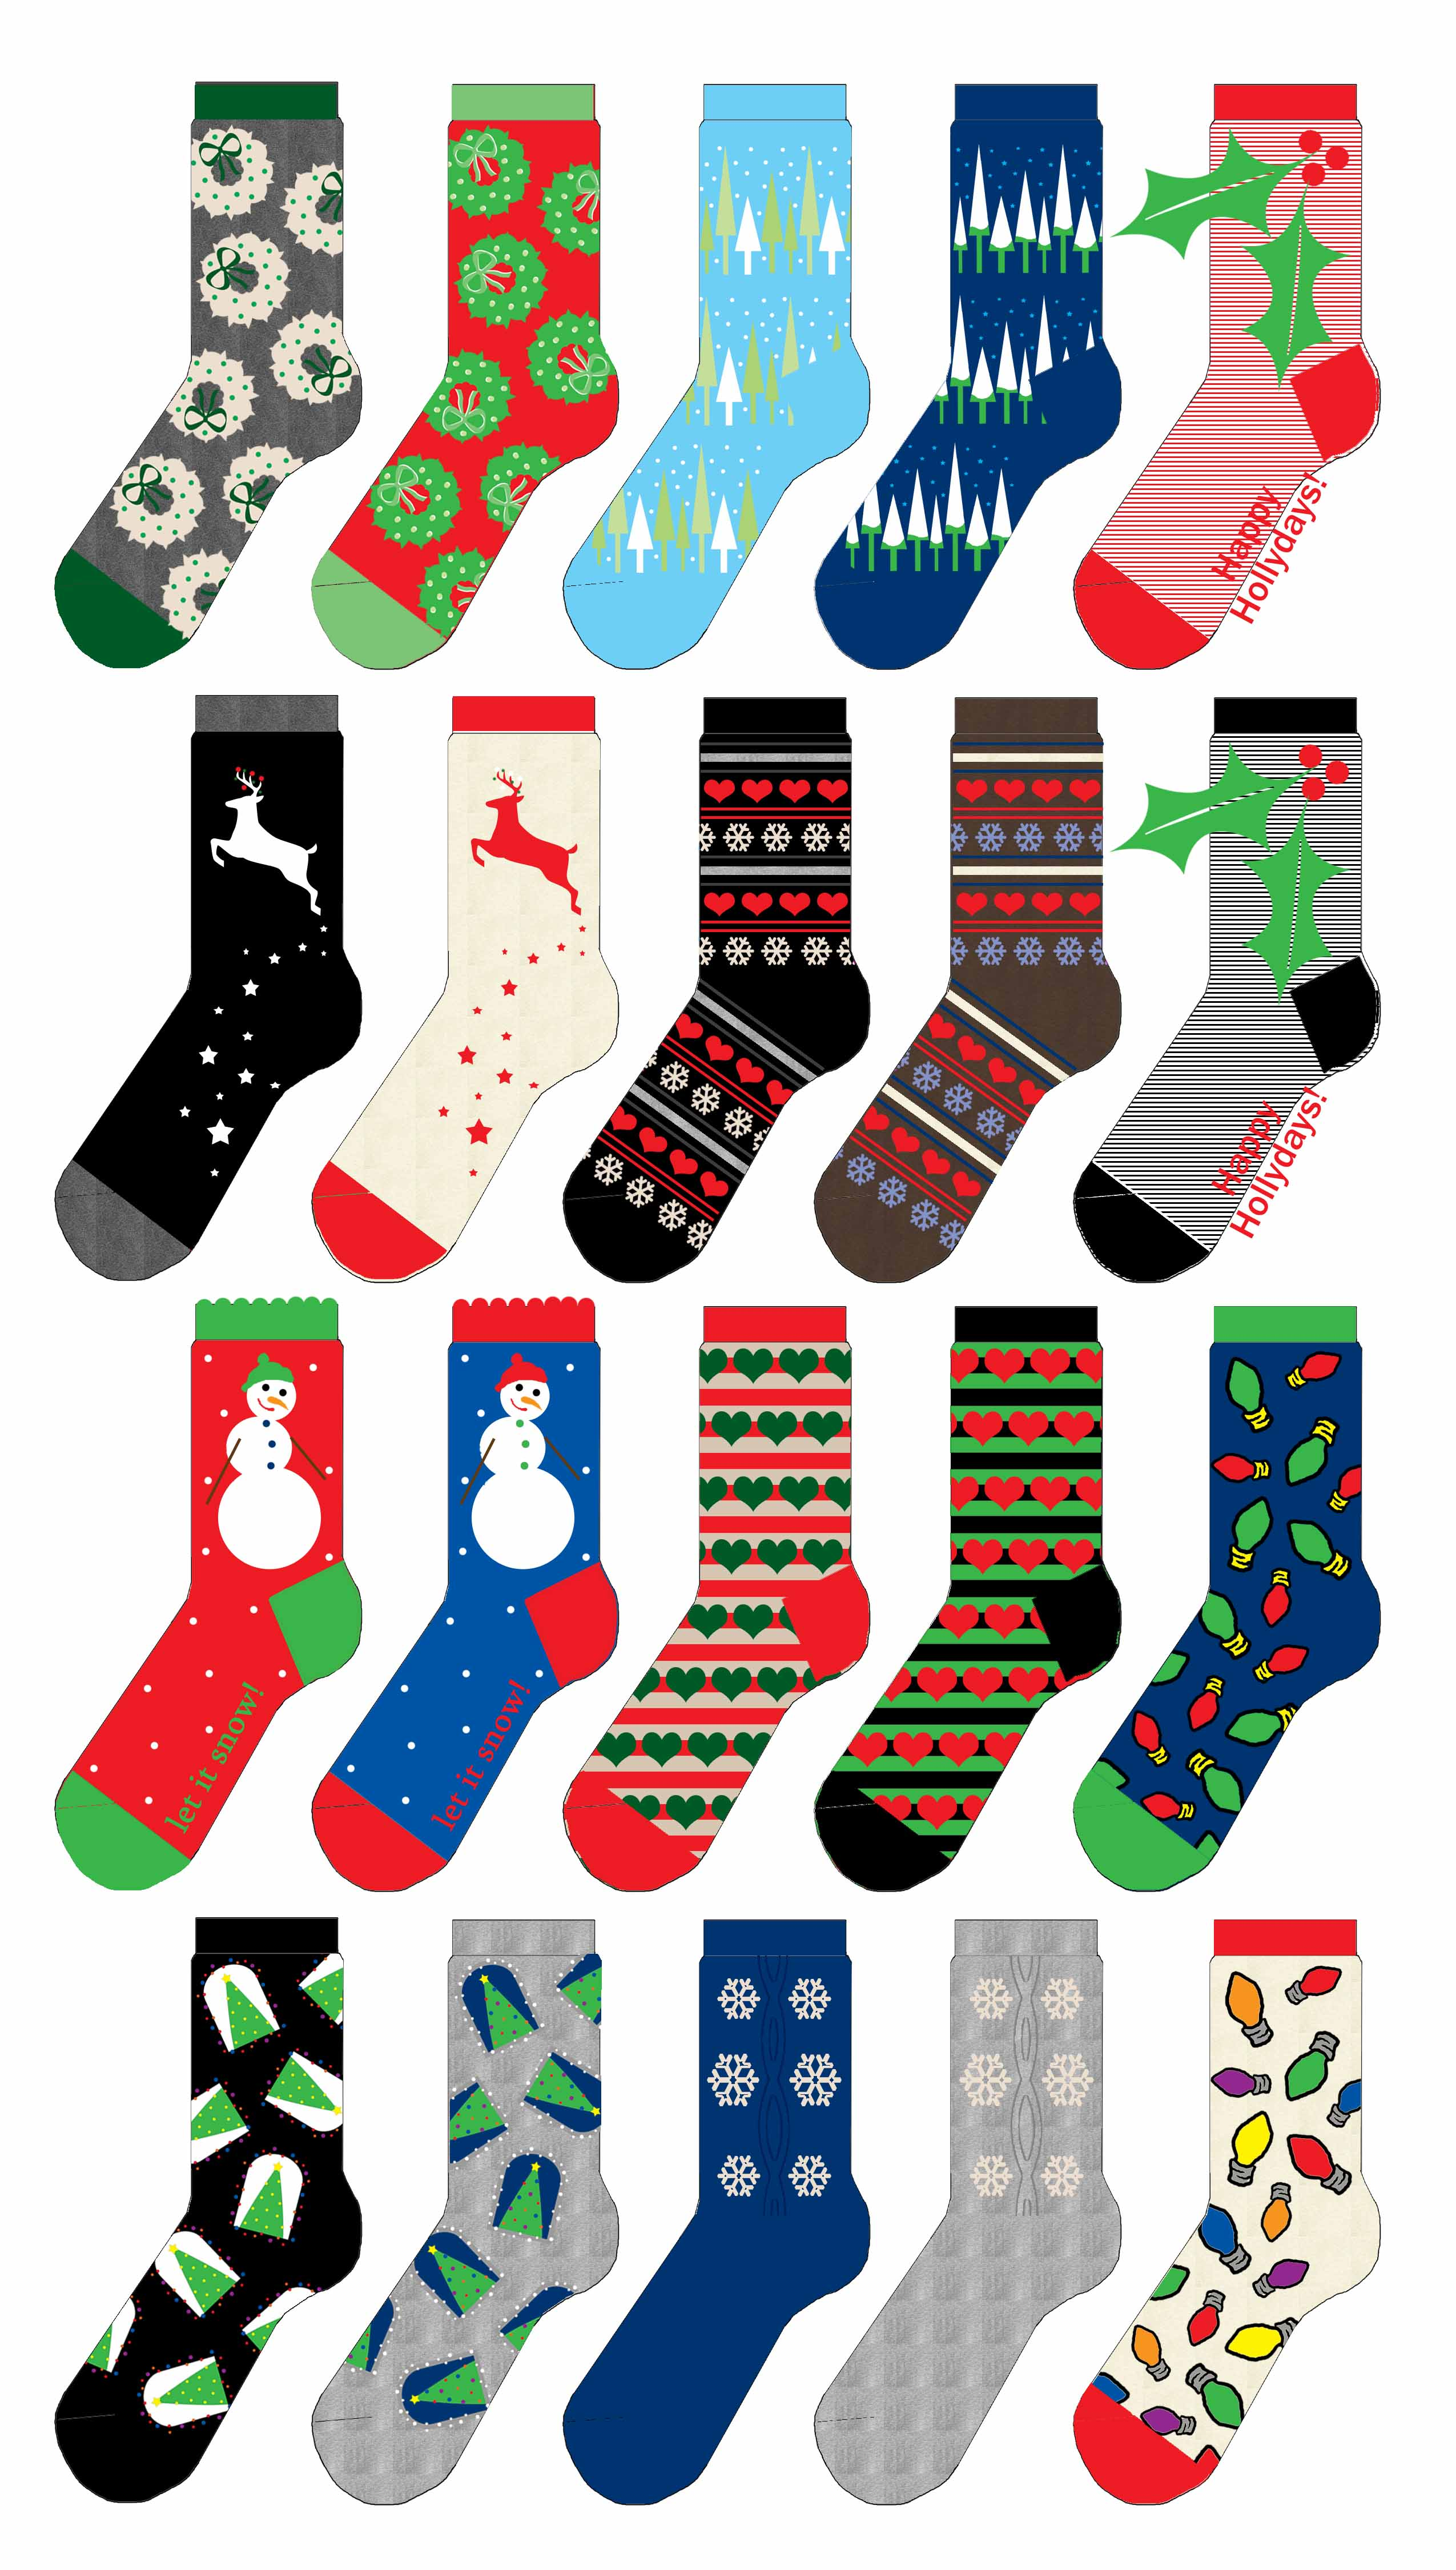 Dana mcpherson sock designs christmas 2 sock designs christmas 2 sock template copy maxwellsz